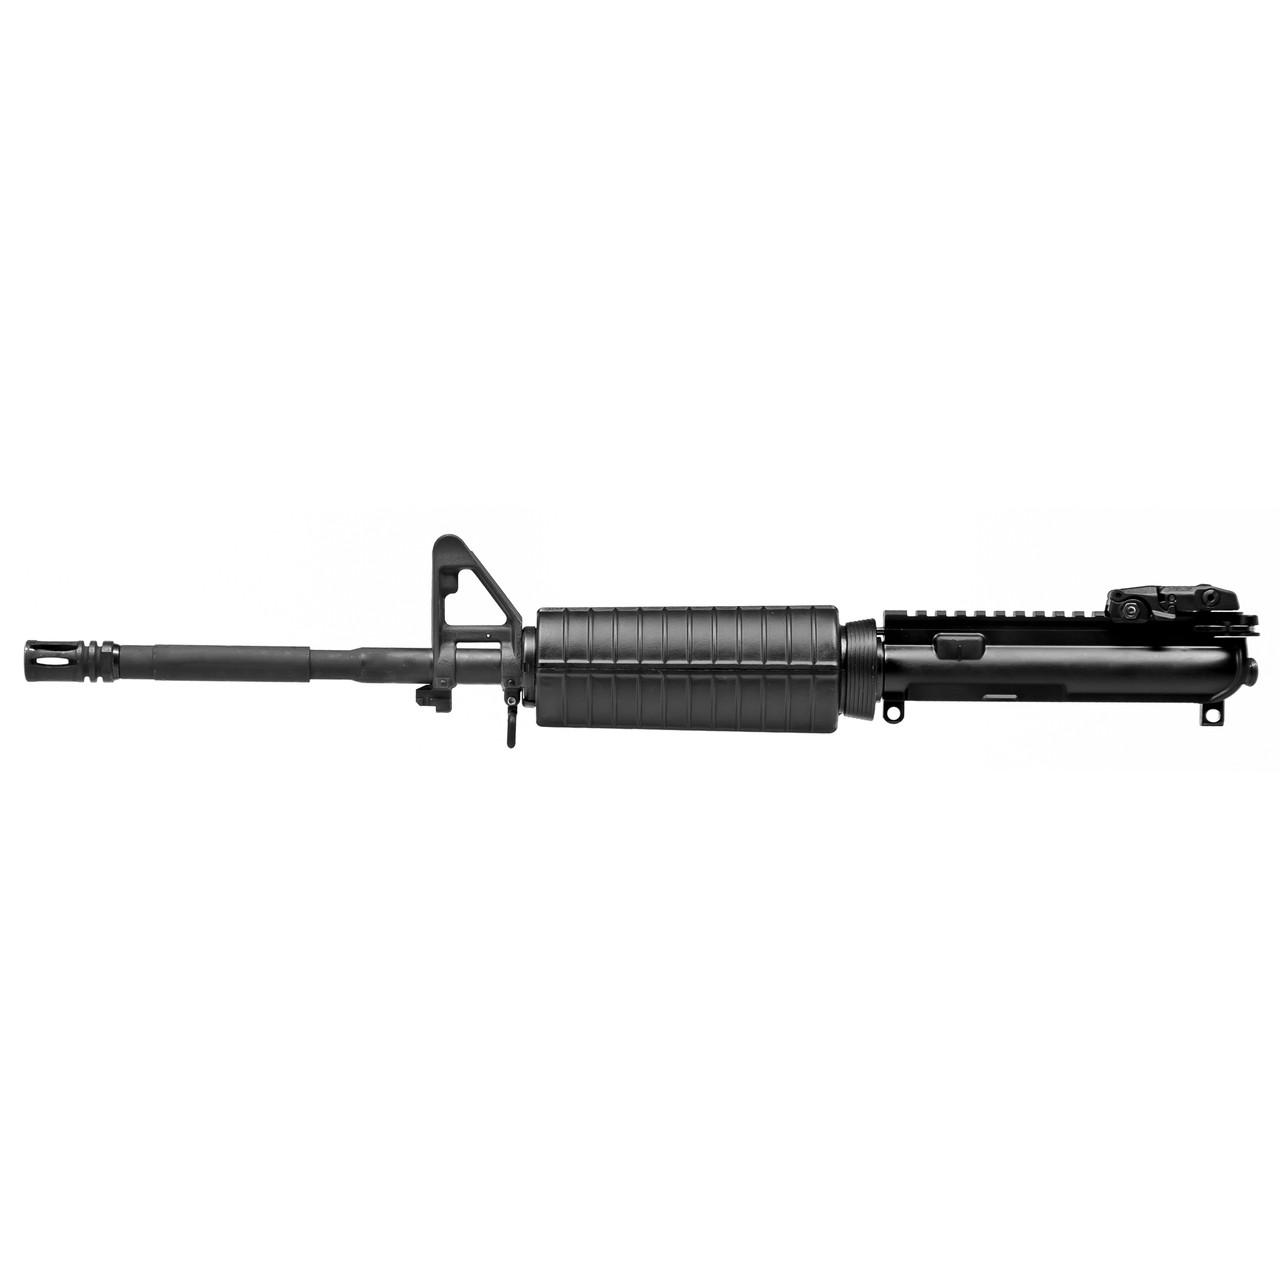 Colt Complete M4 Upper CALIFORNIA LEGAL - .223/5.56